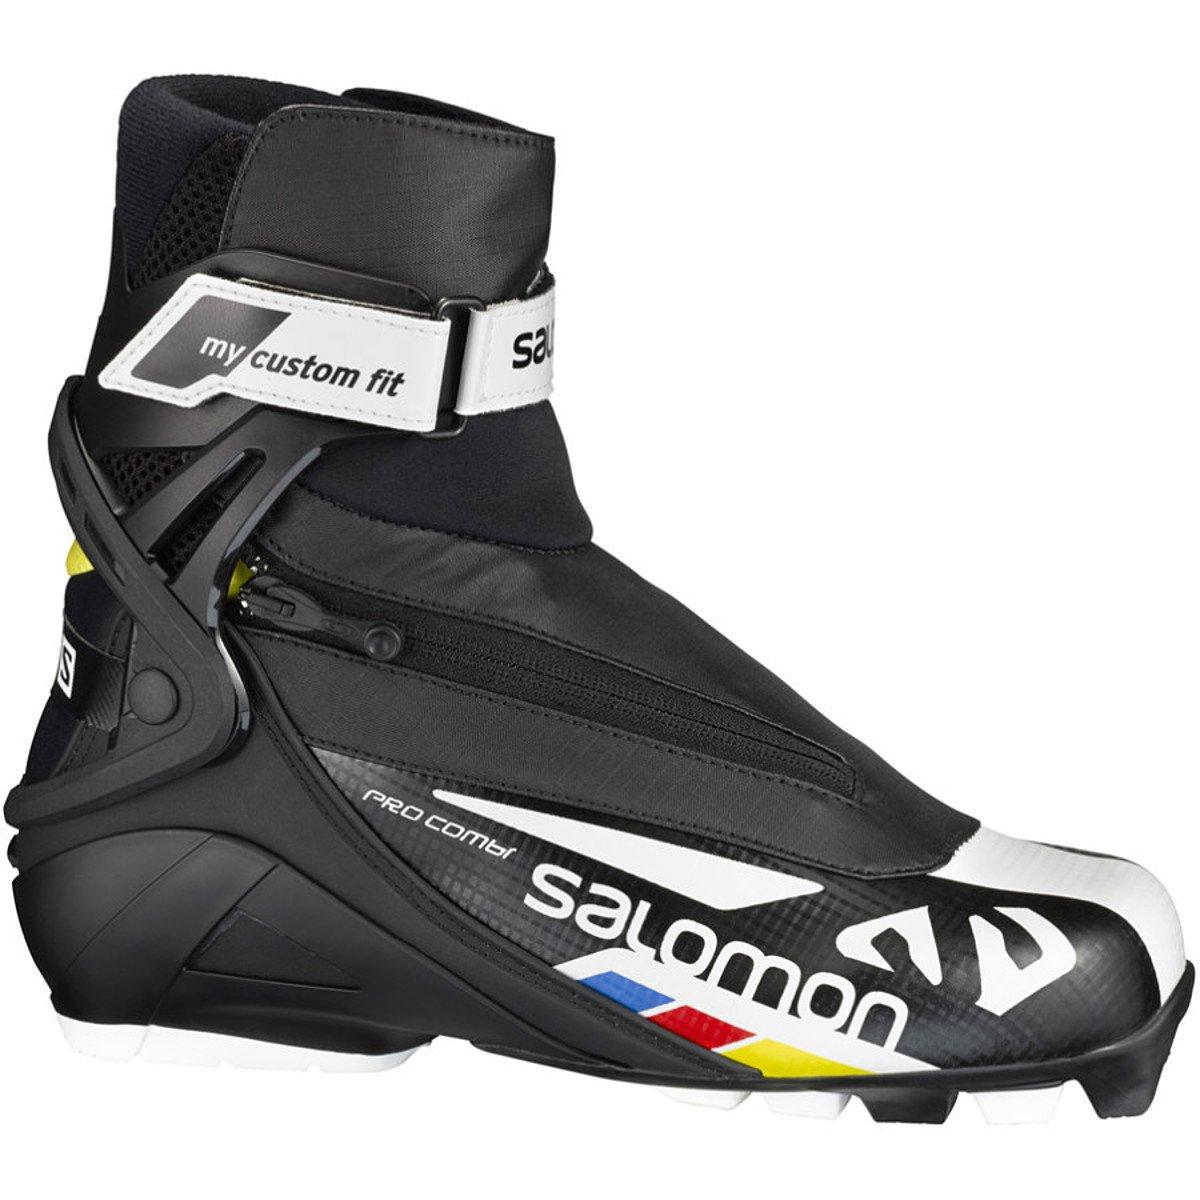 Winning Salomon Pilot Boot Salomon Sneakers Review Running